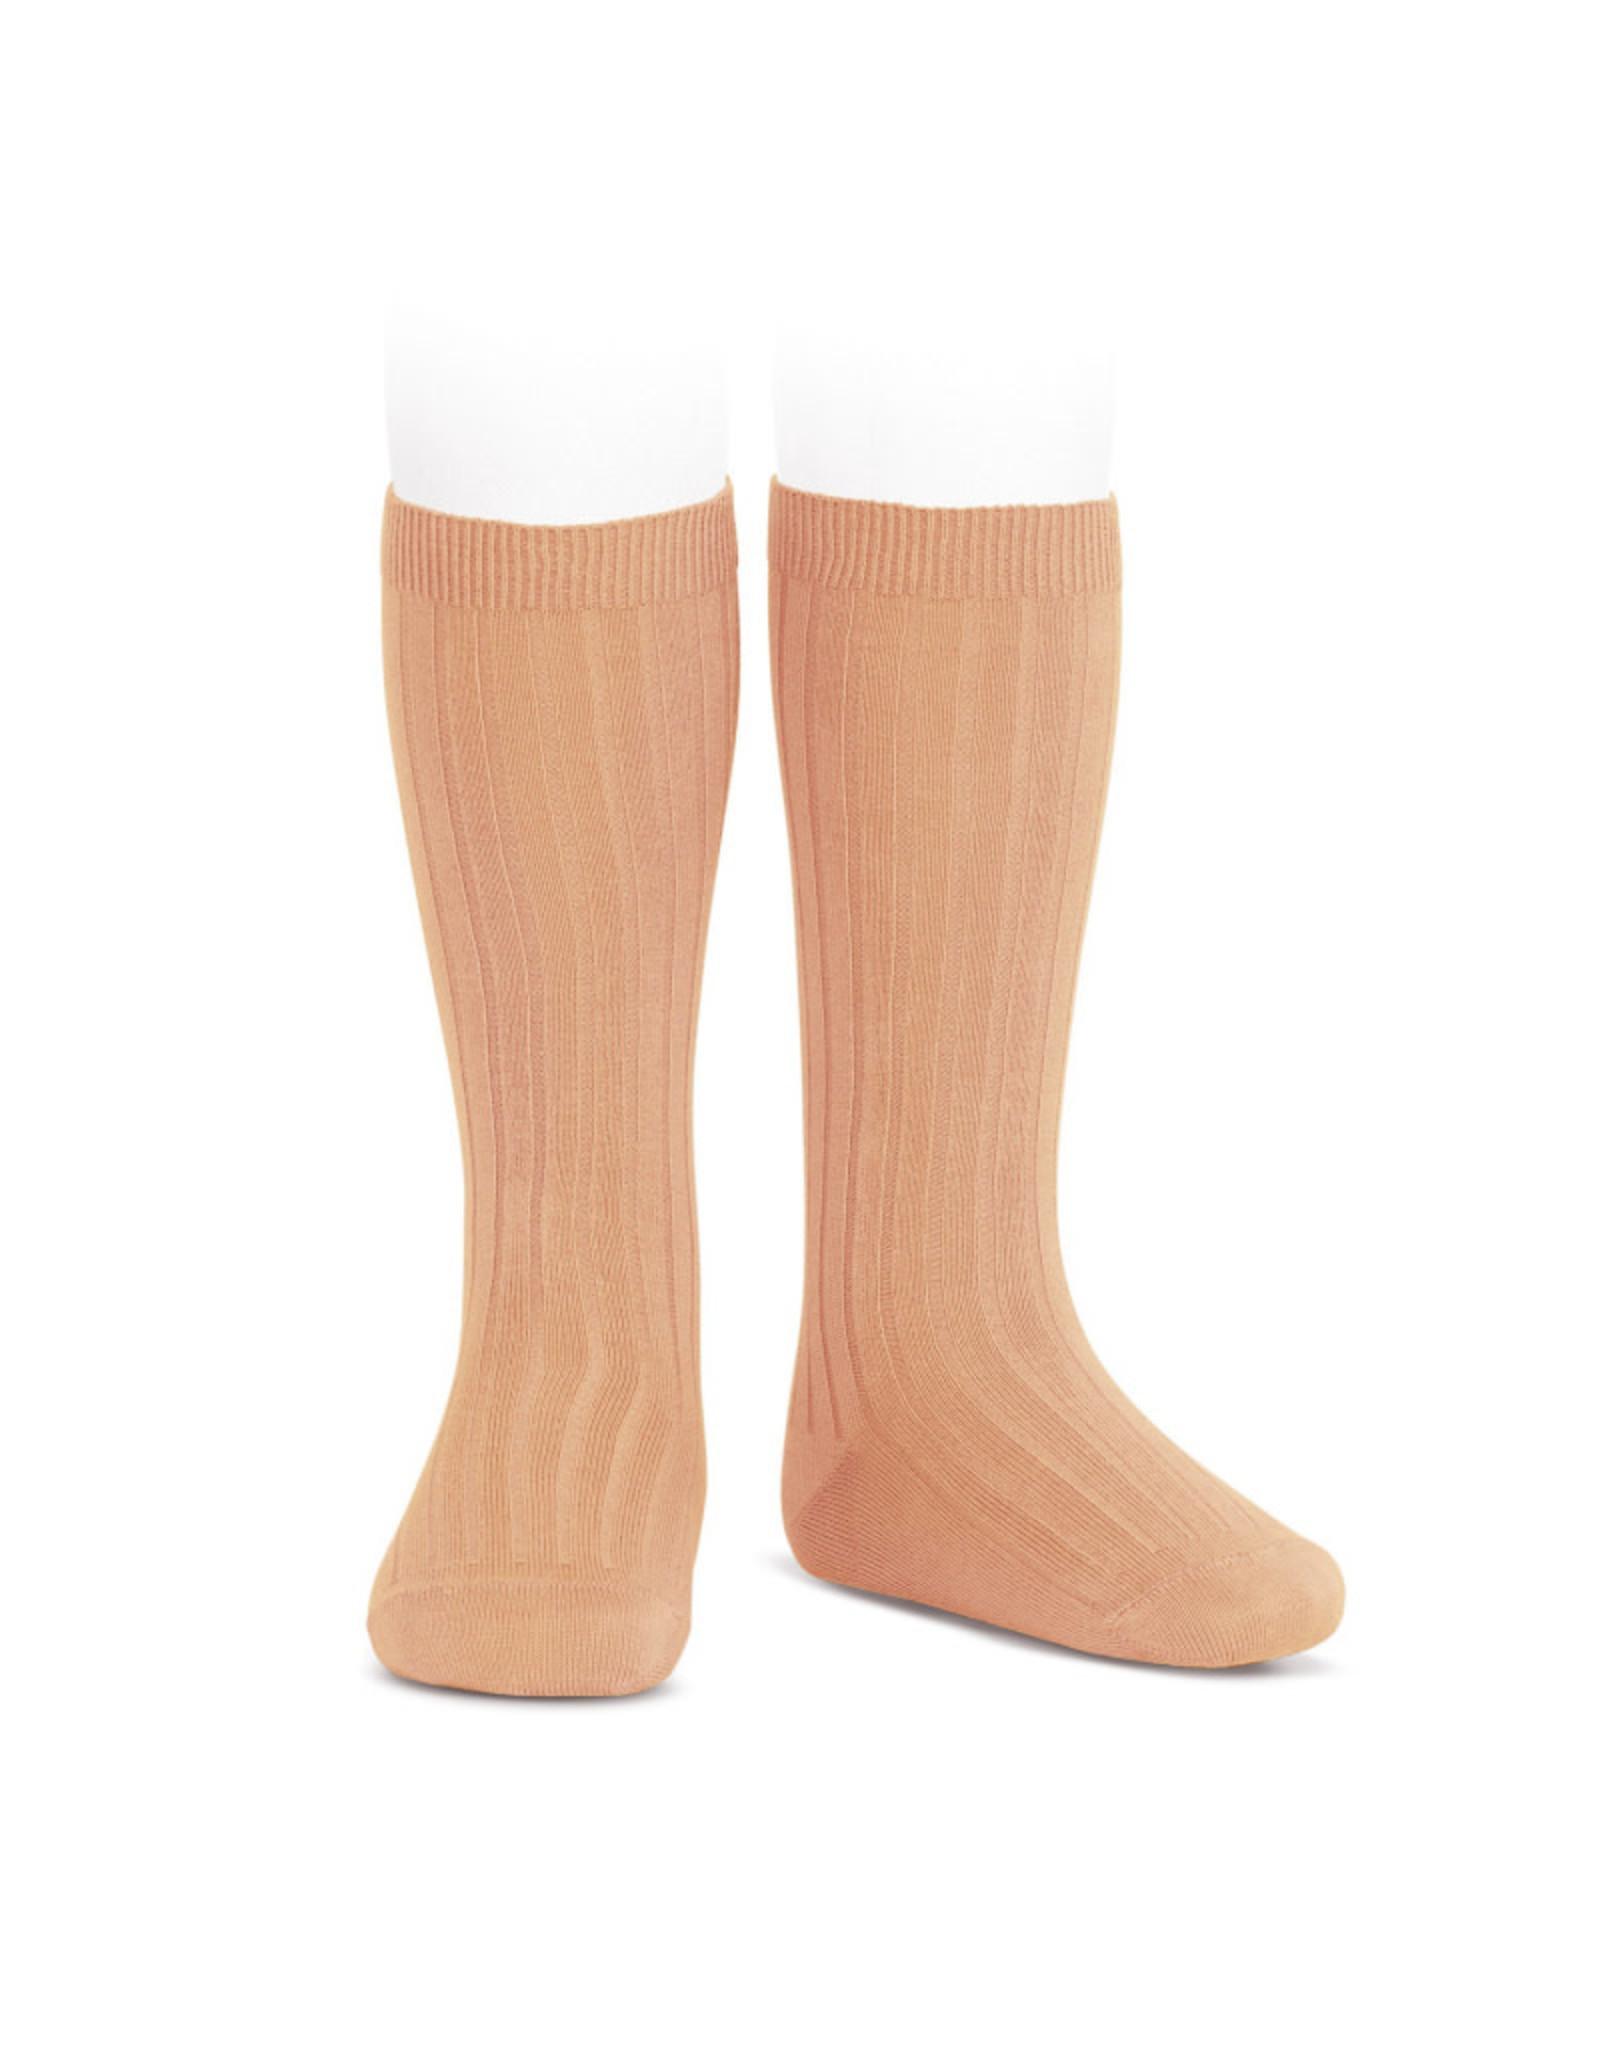 CONDOR Peach Ribbed Knee Socks